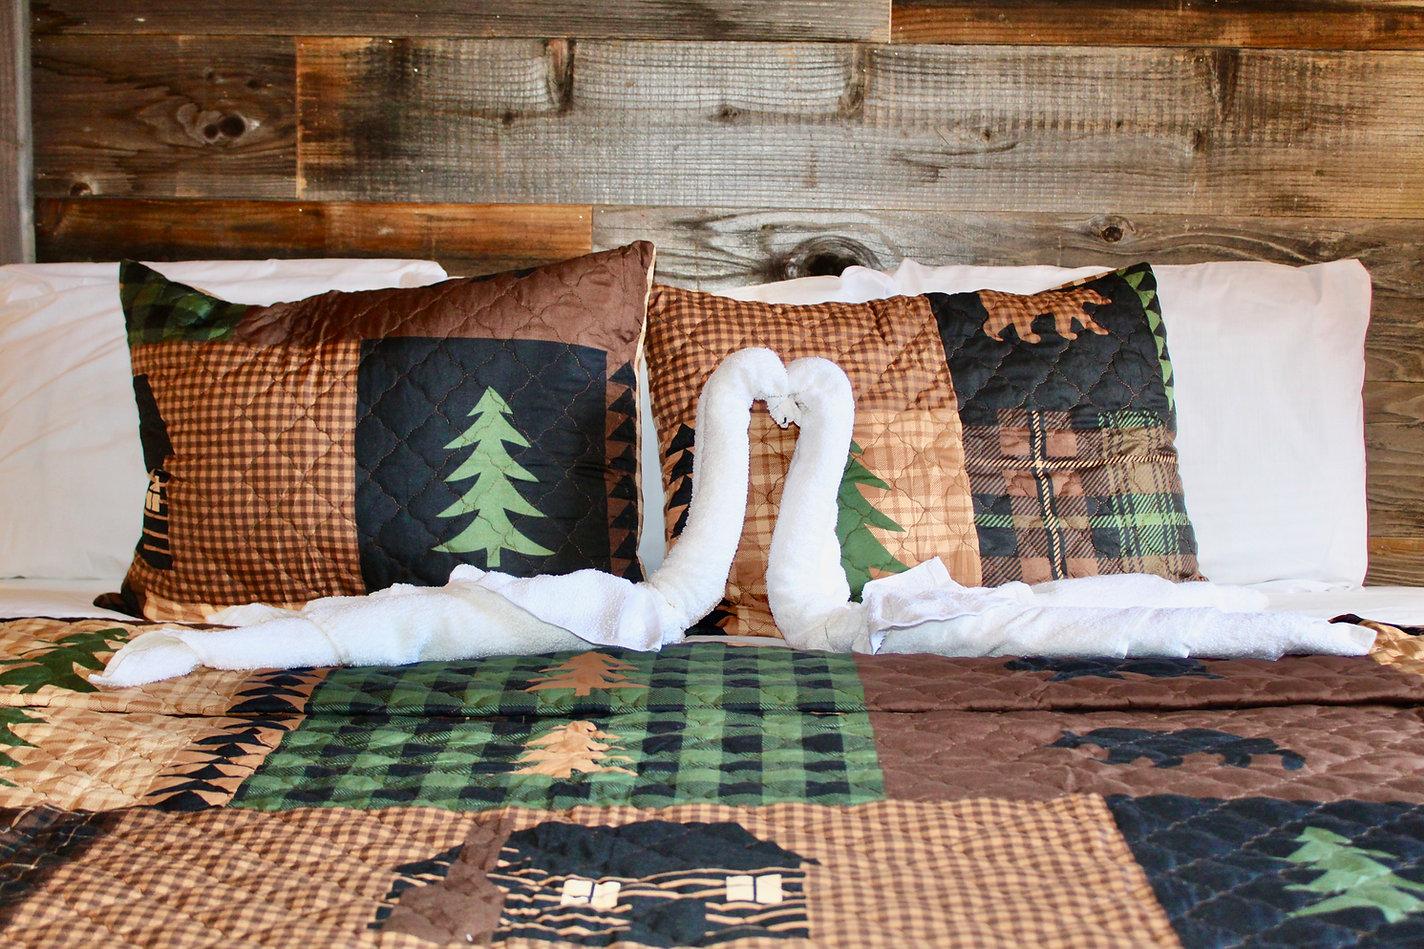 handmade barnwood headboard with rustic bedding and swan shaped towel sculpture at the sundowner on lake george